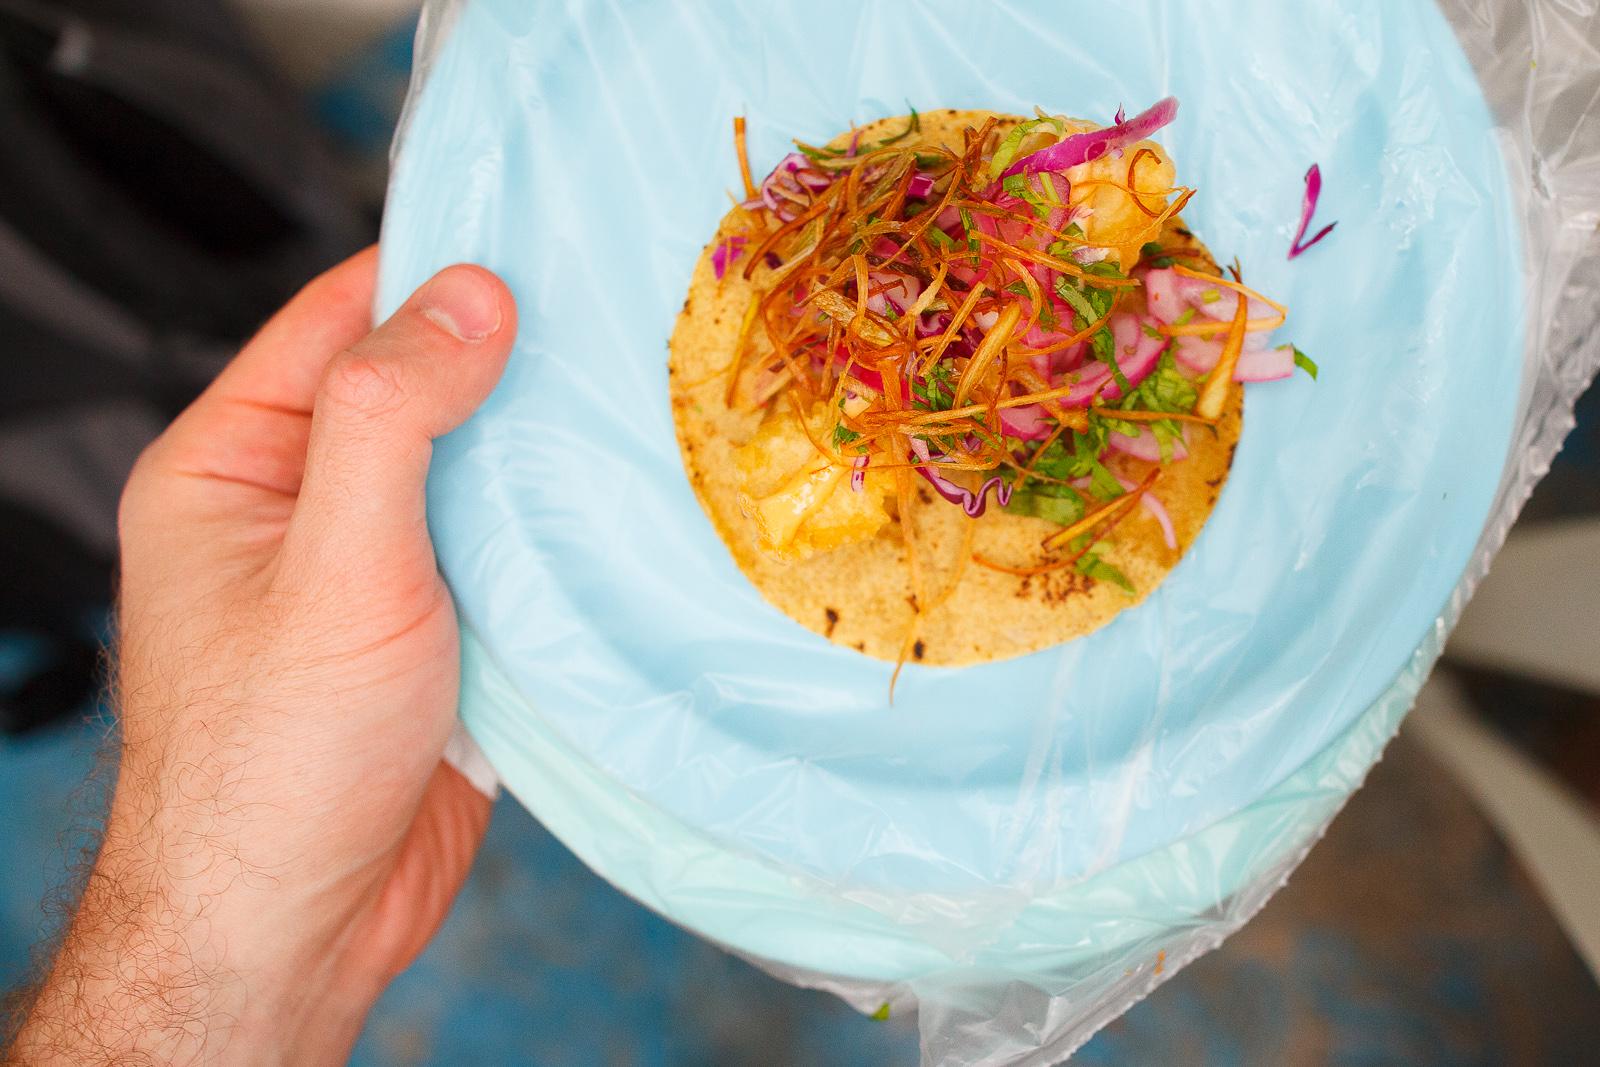 Taco de pescado ensabanado - tiras de filete de pescado capeados